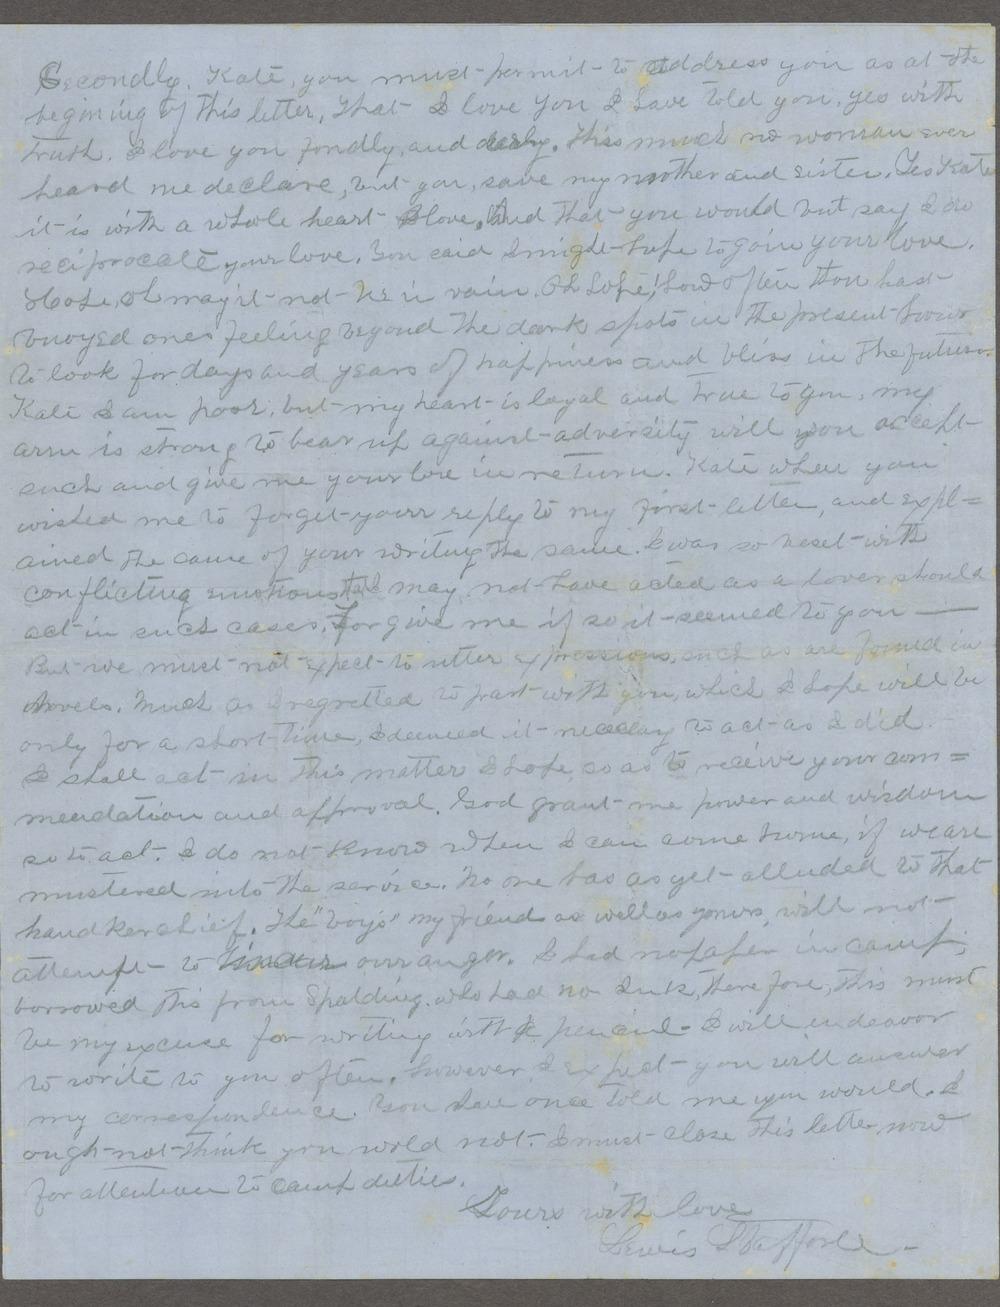 Lewis Stafford to Kate Newland correspondence - 10